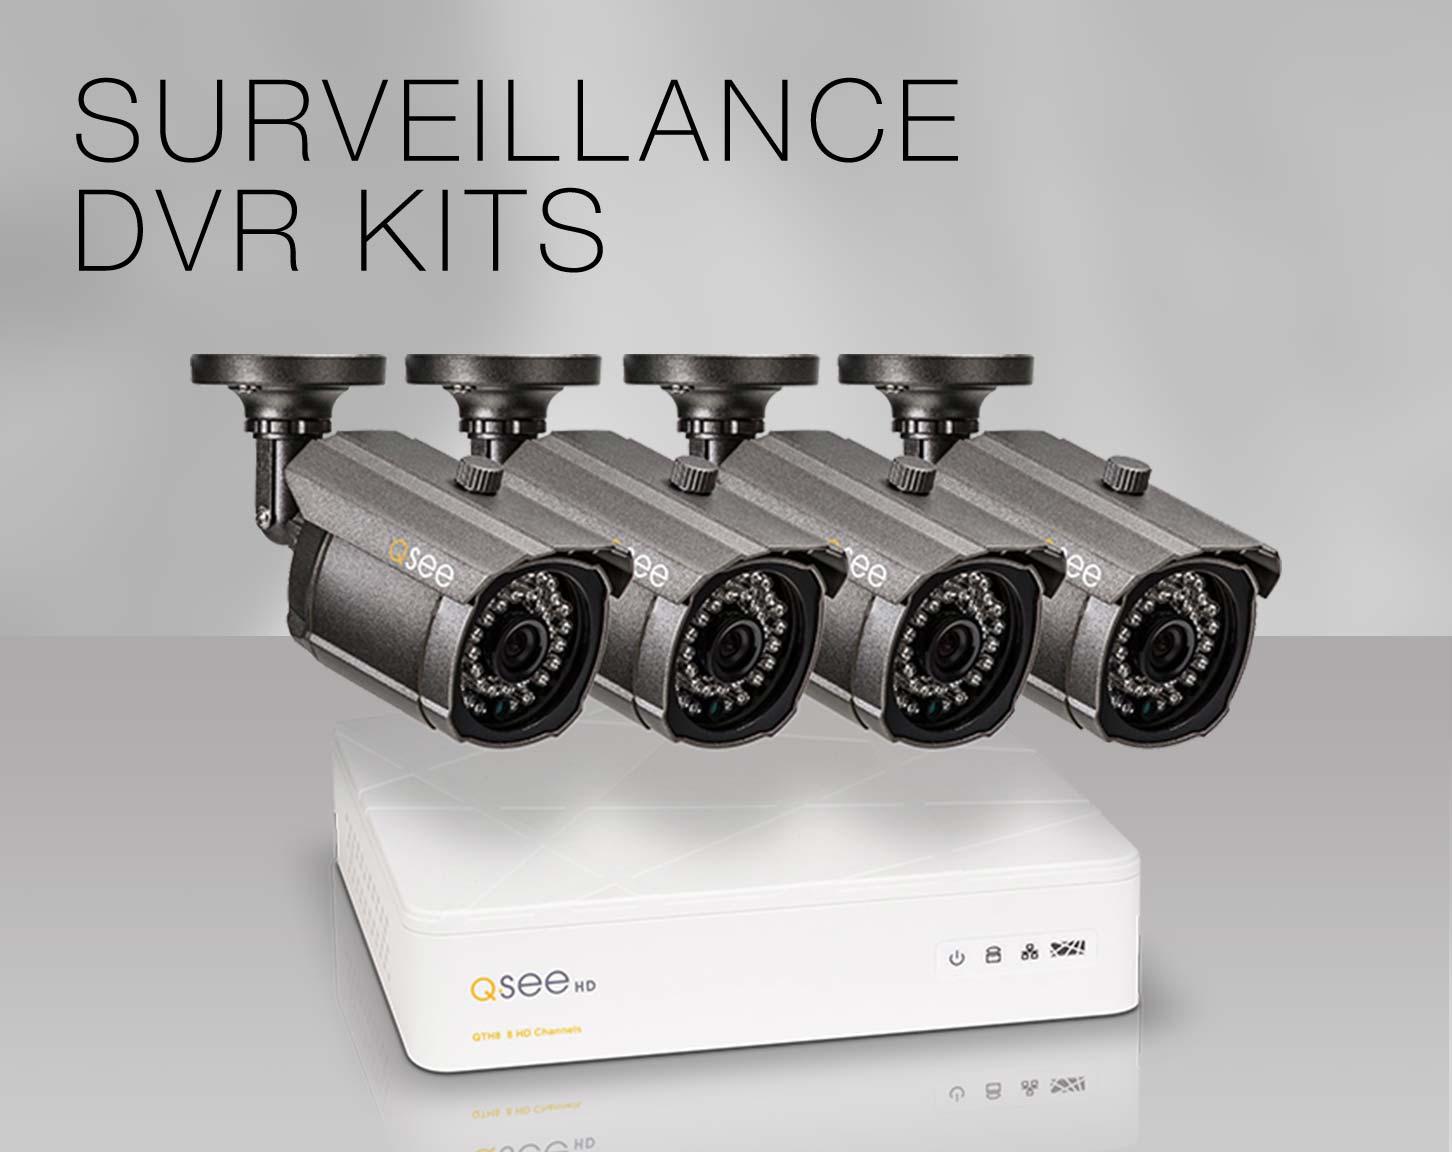 Surveillance DVR Kits